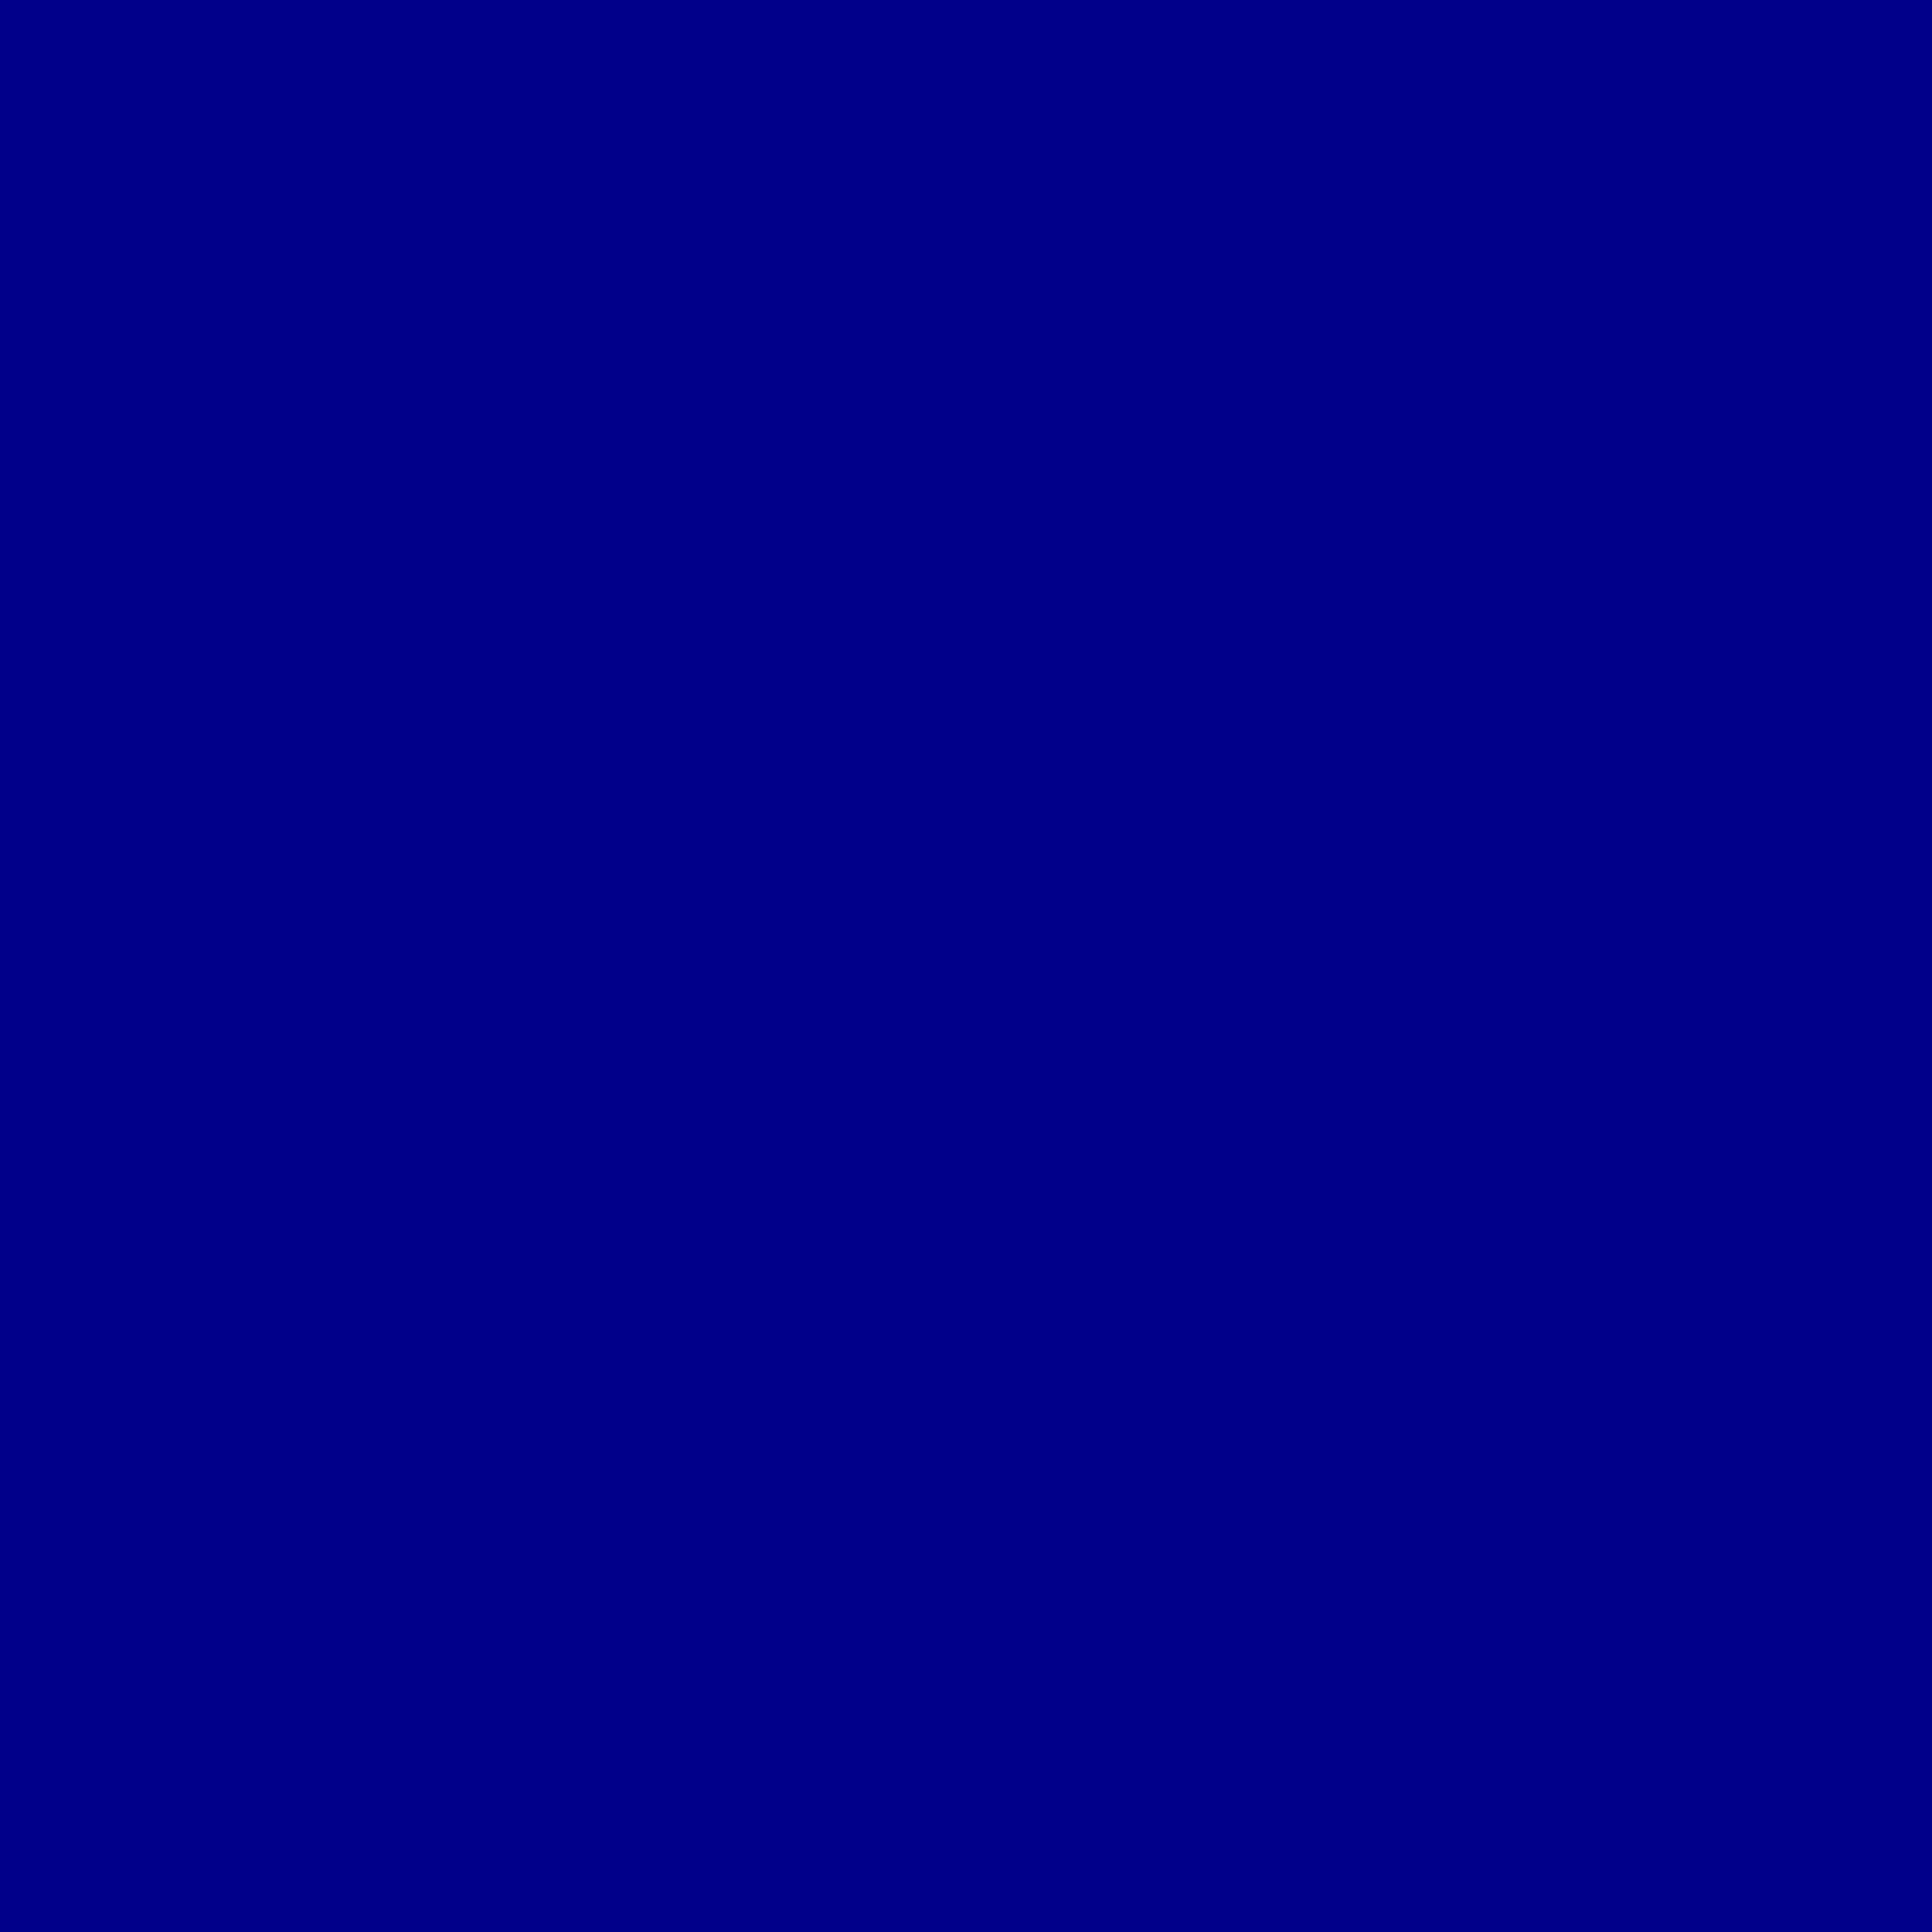 3600x3600 Dark Blue Solid Color Background